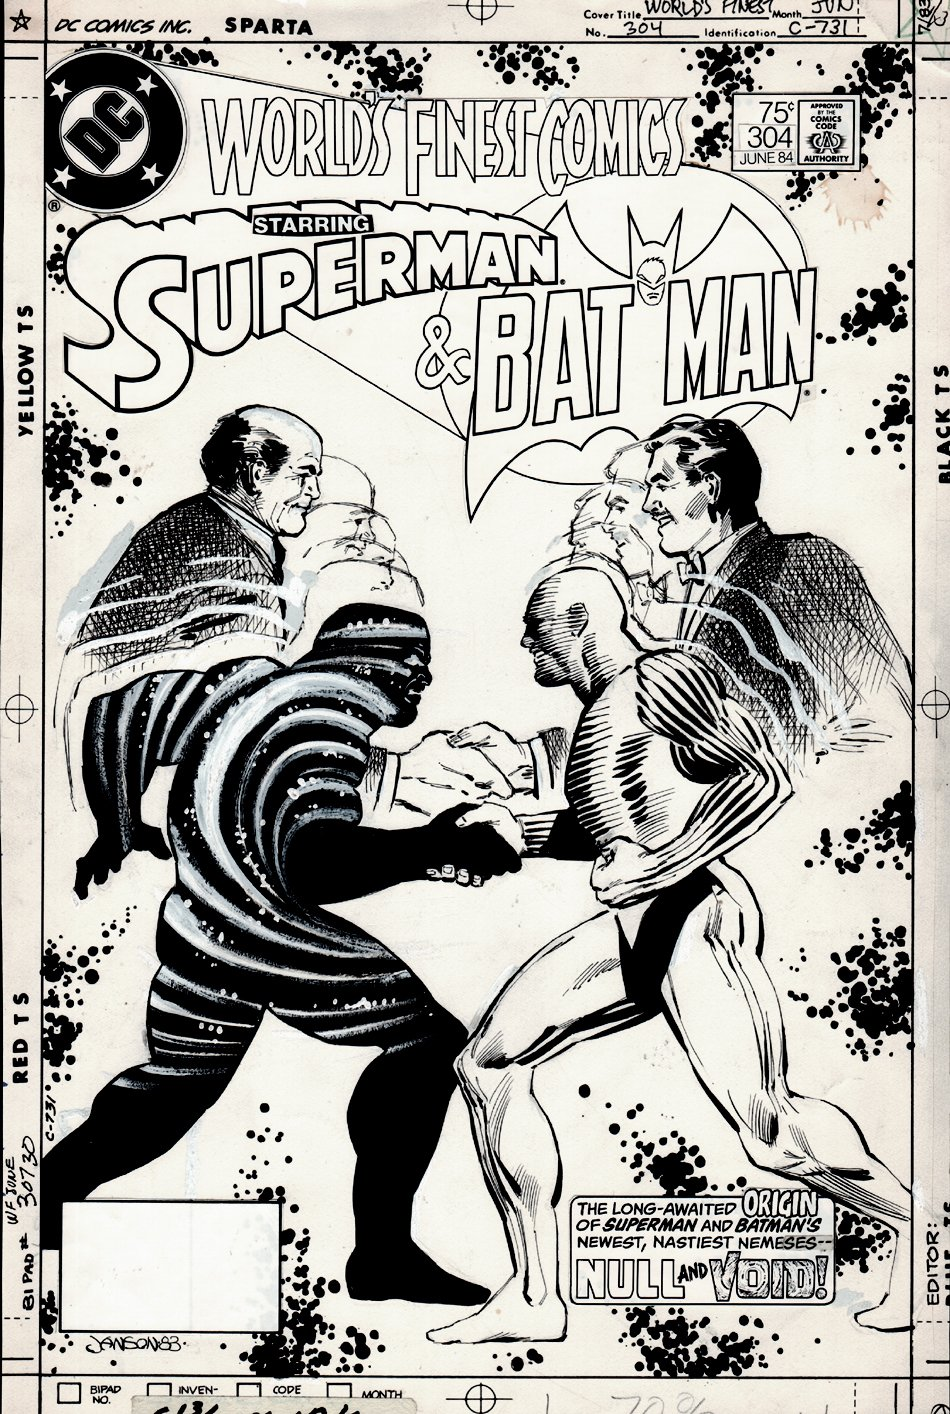 World's Finest Comics #304 Cover (1983)